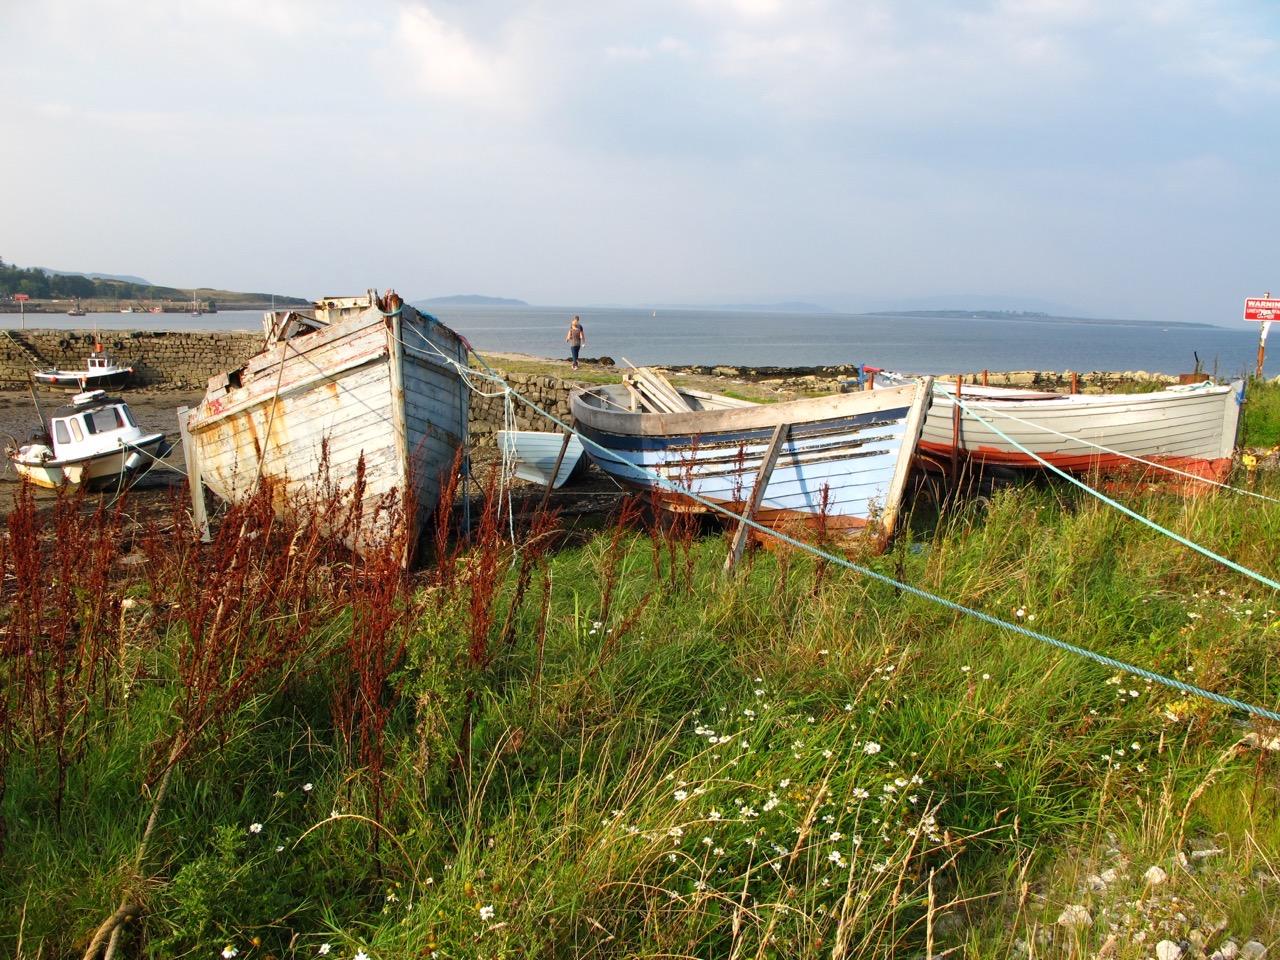 Boats on the Isle of Skye